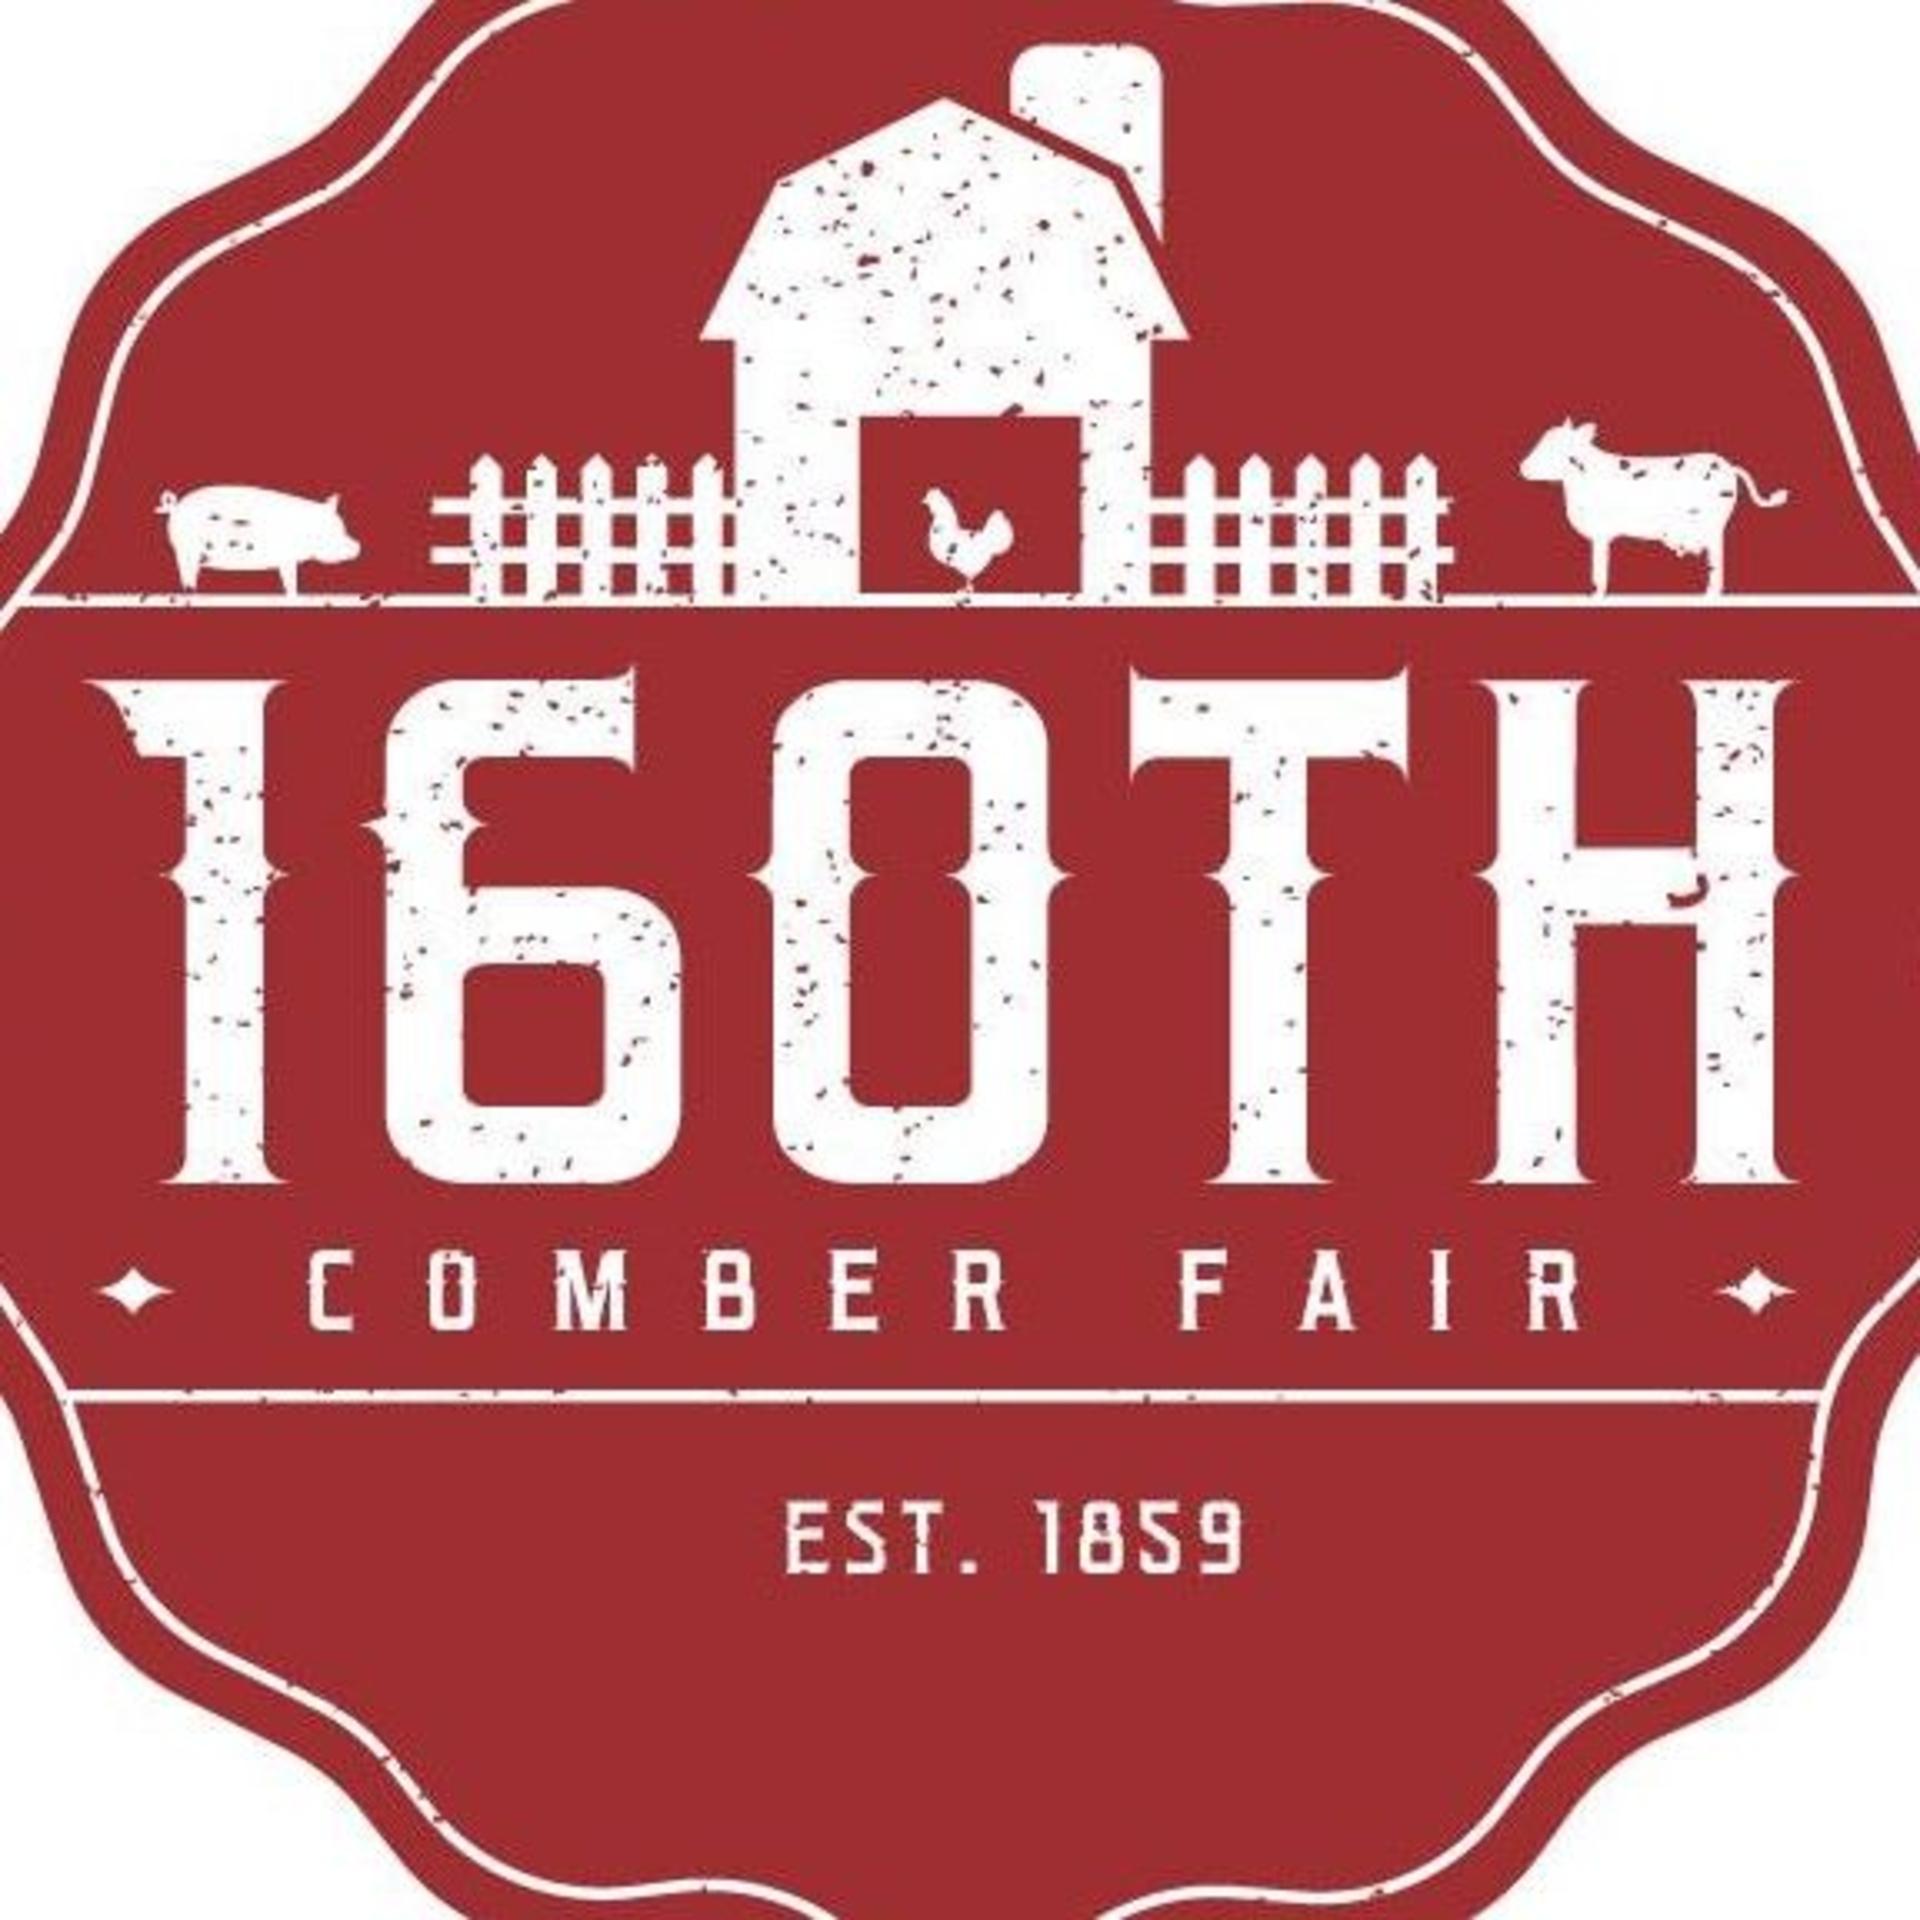 Comber Fair